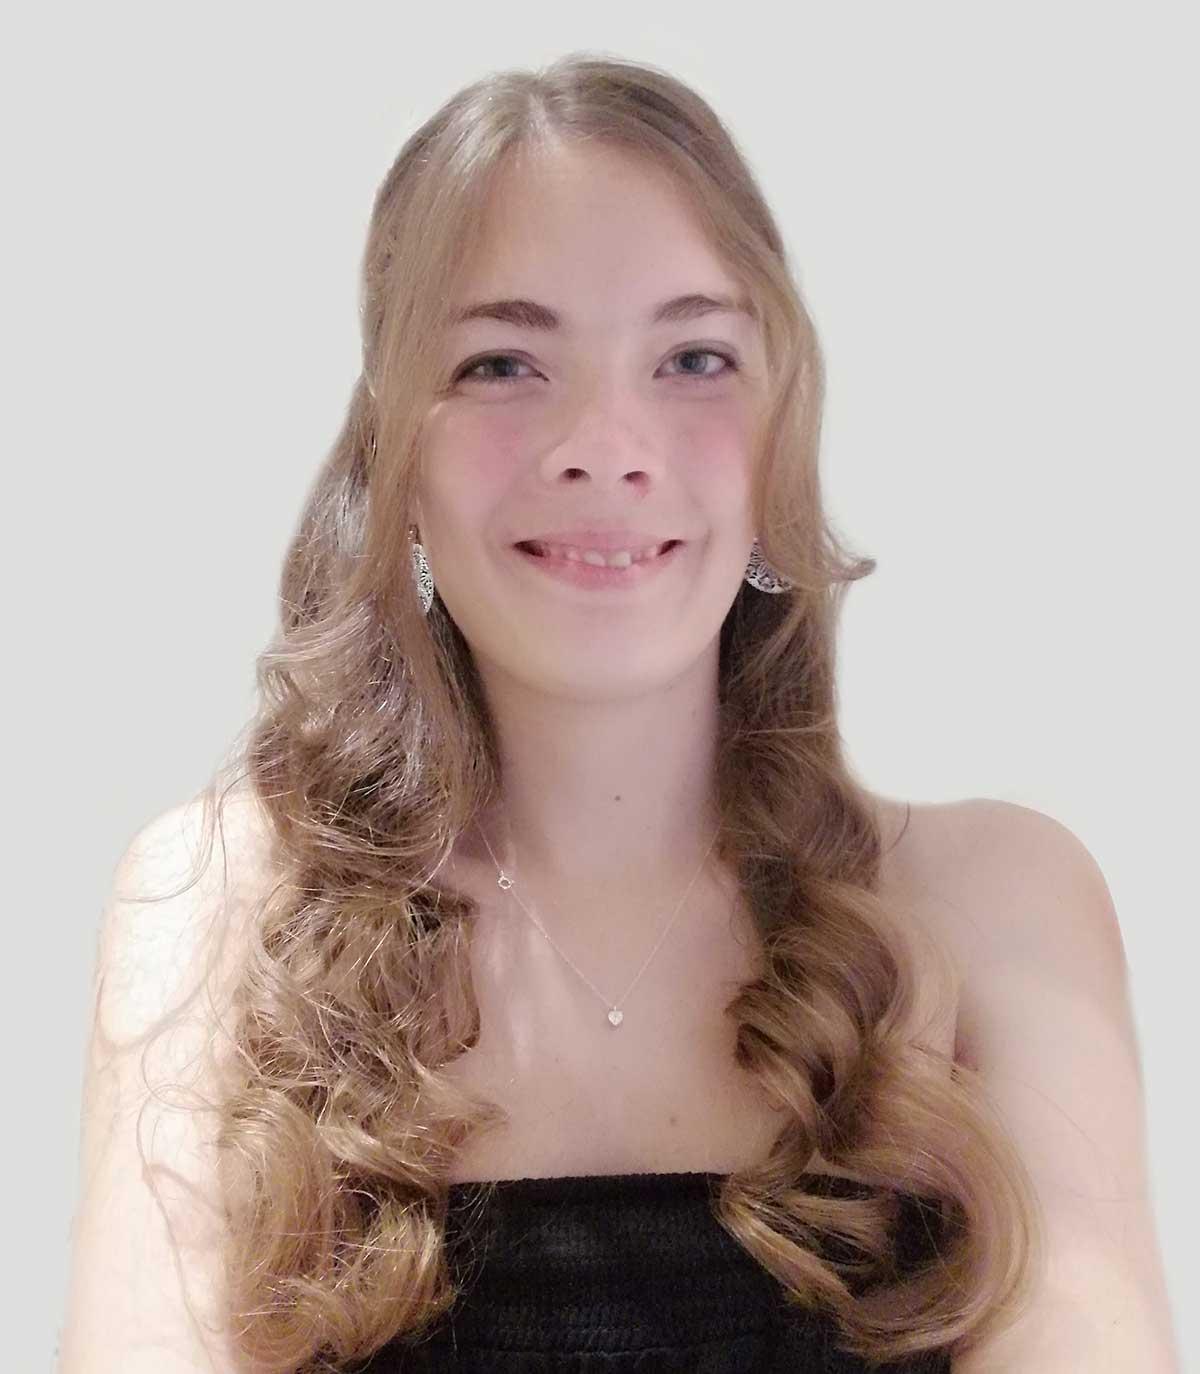 Jacqueline Kaubek